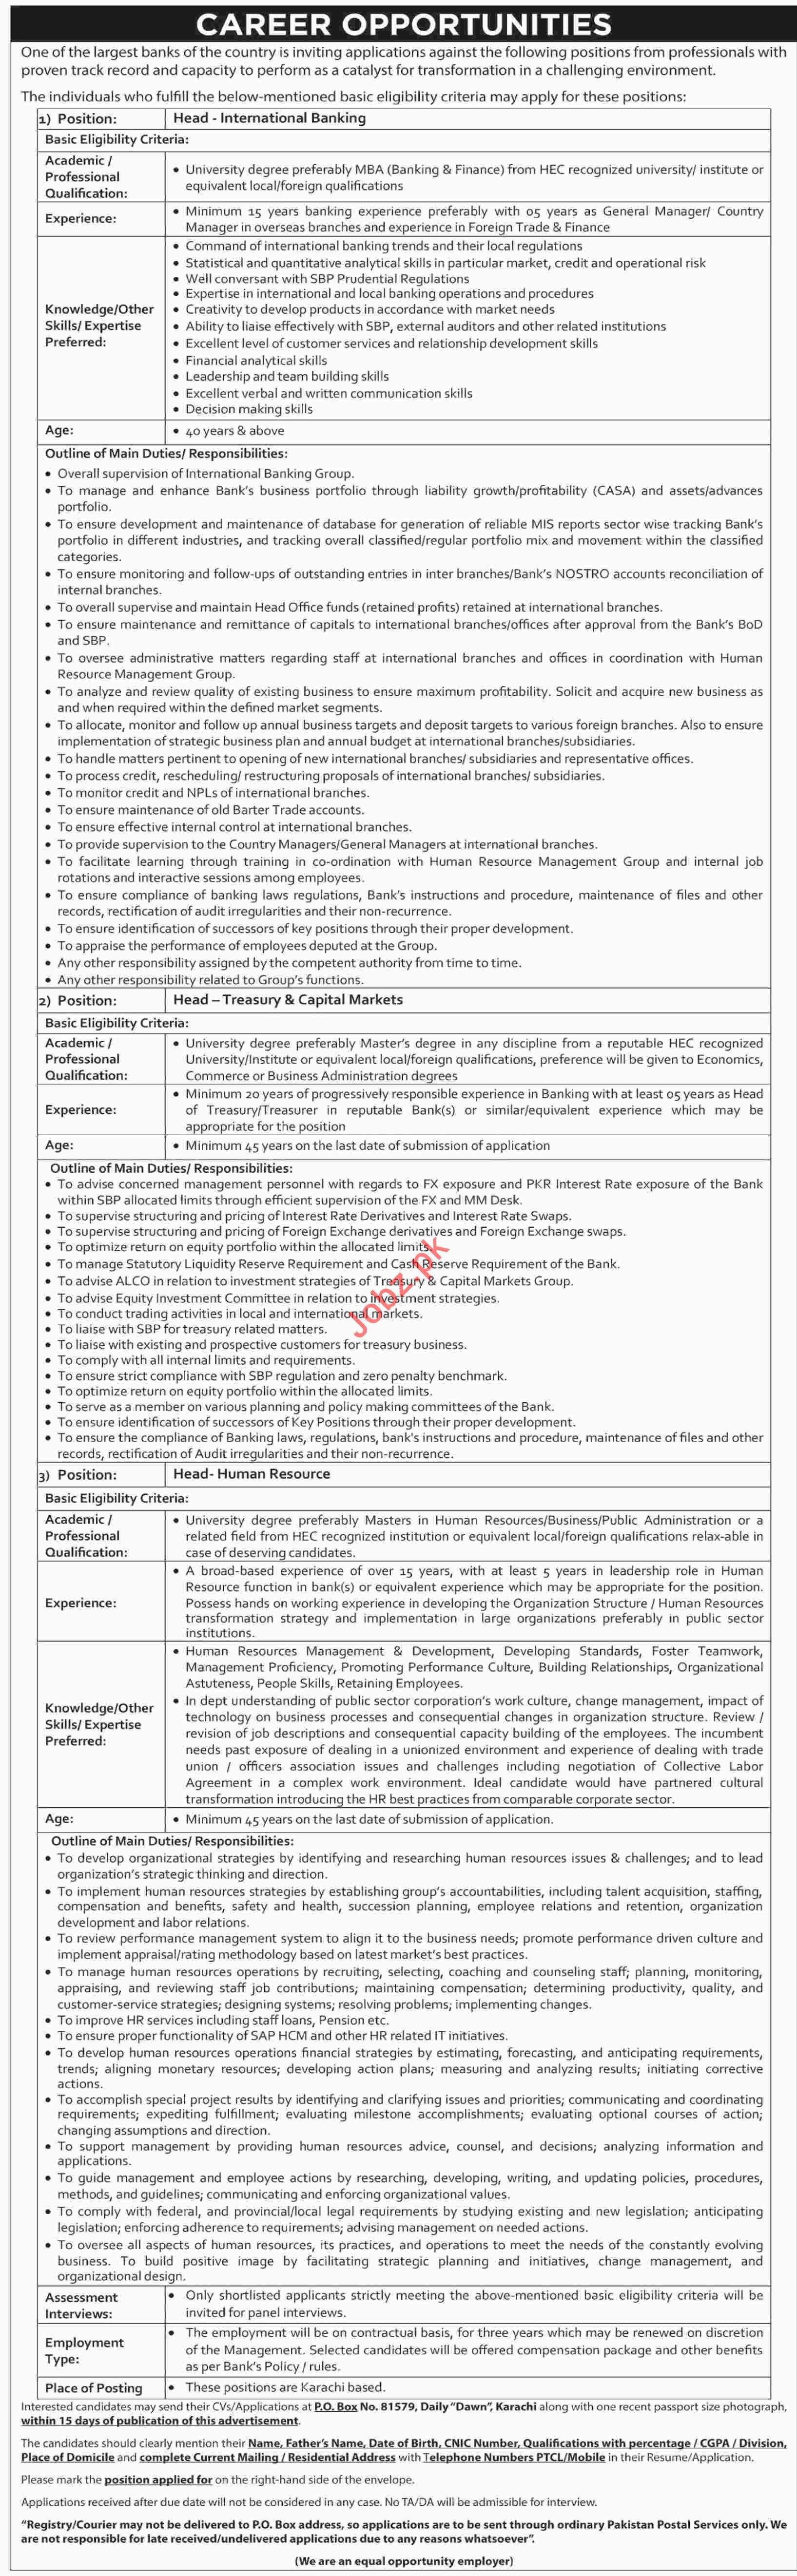 Public Sector Organization Management Jobs